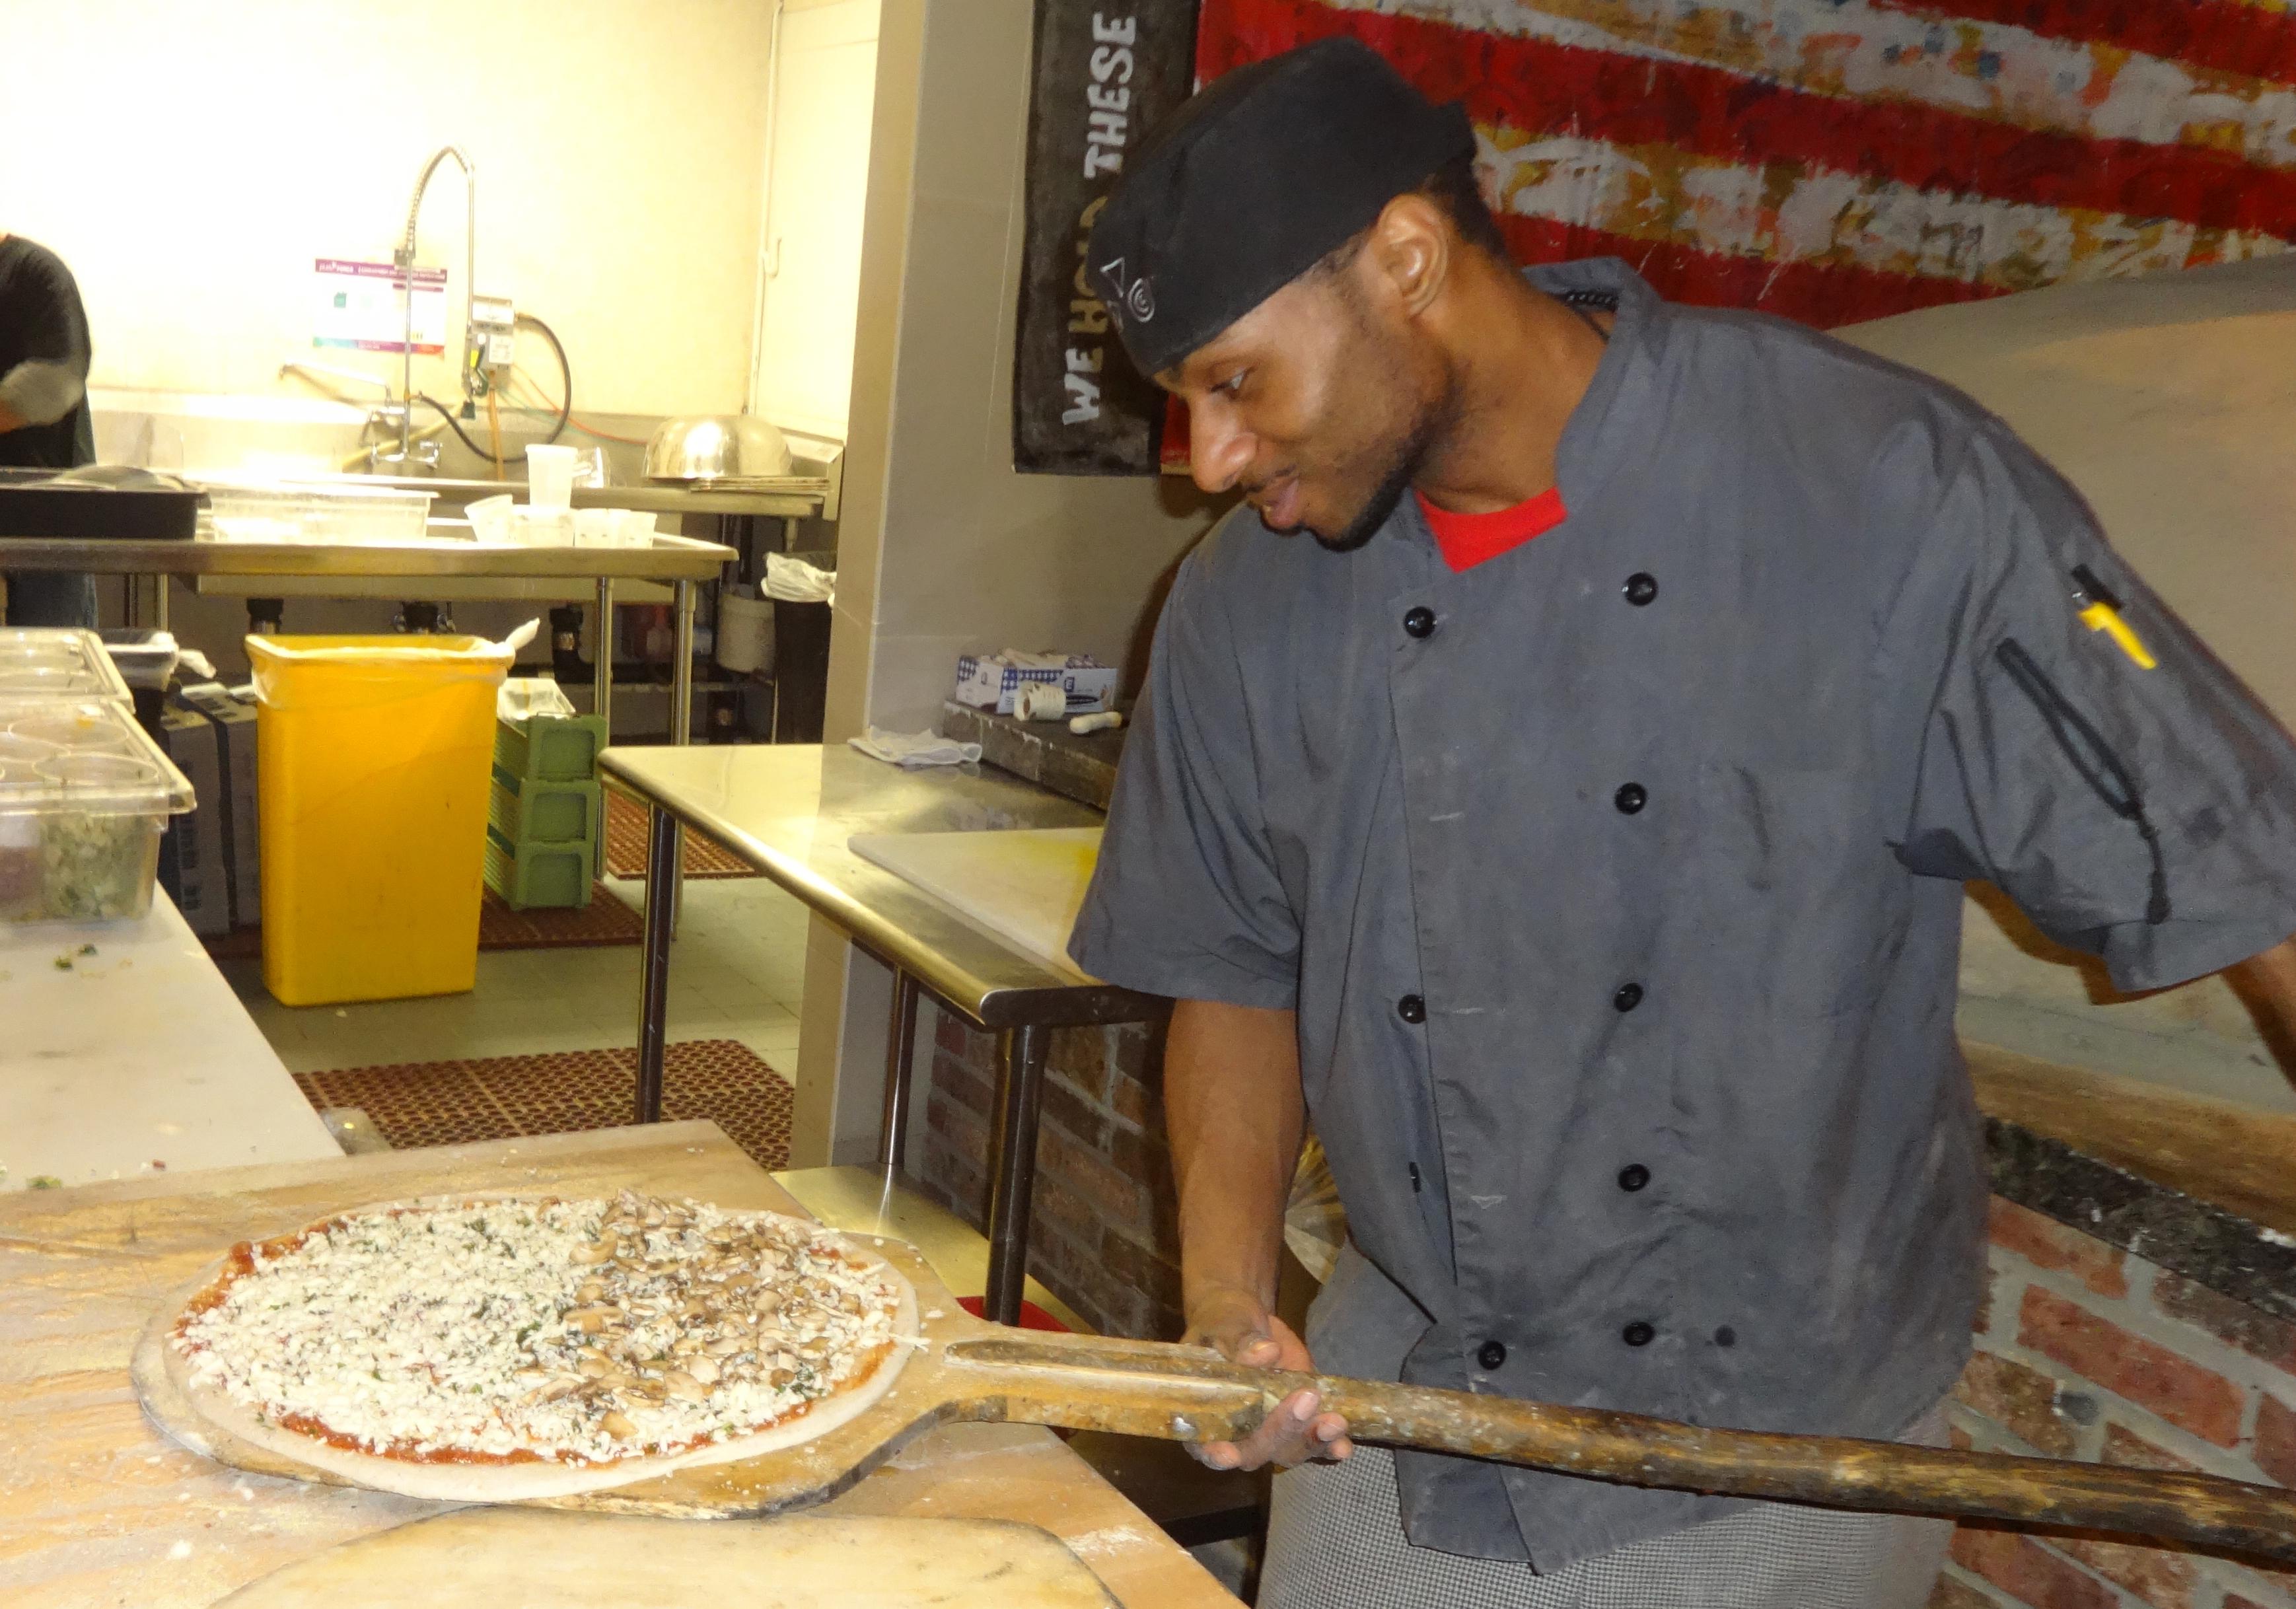 American Flatbread oven chef crop